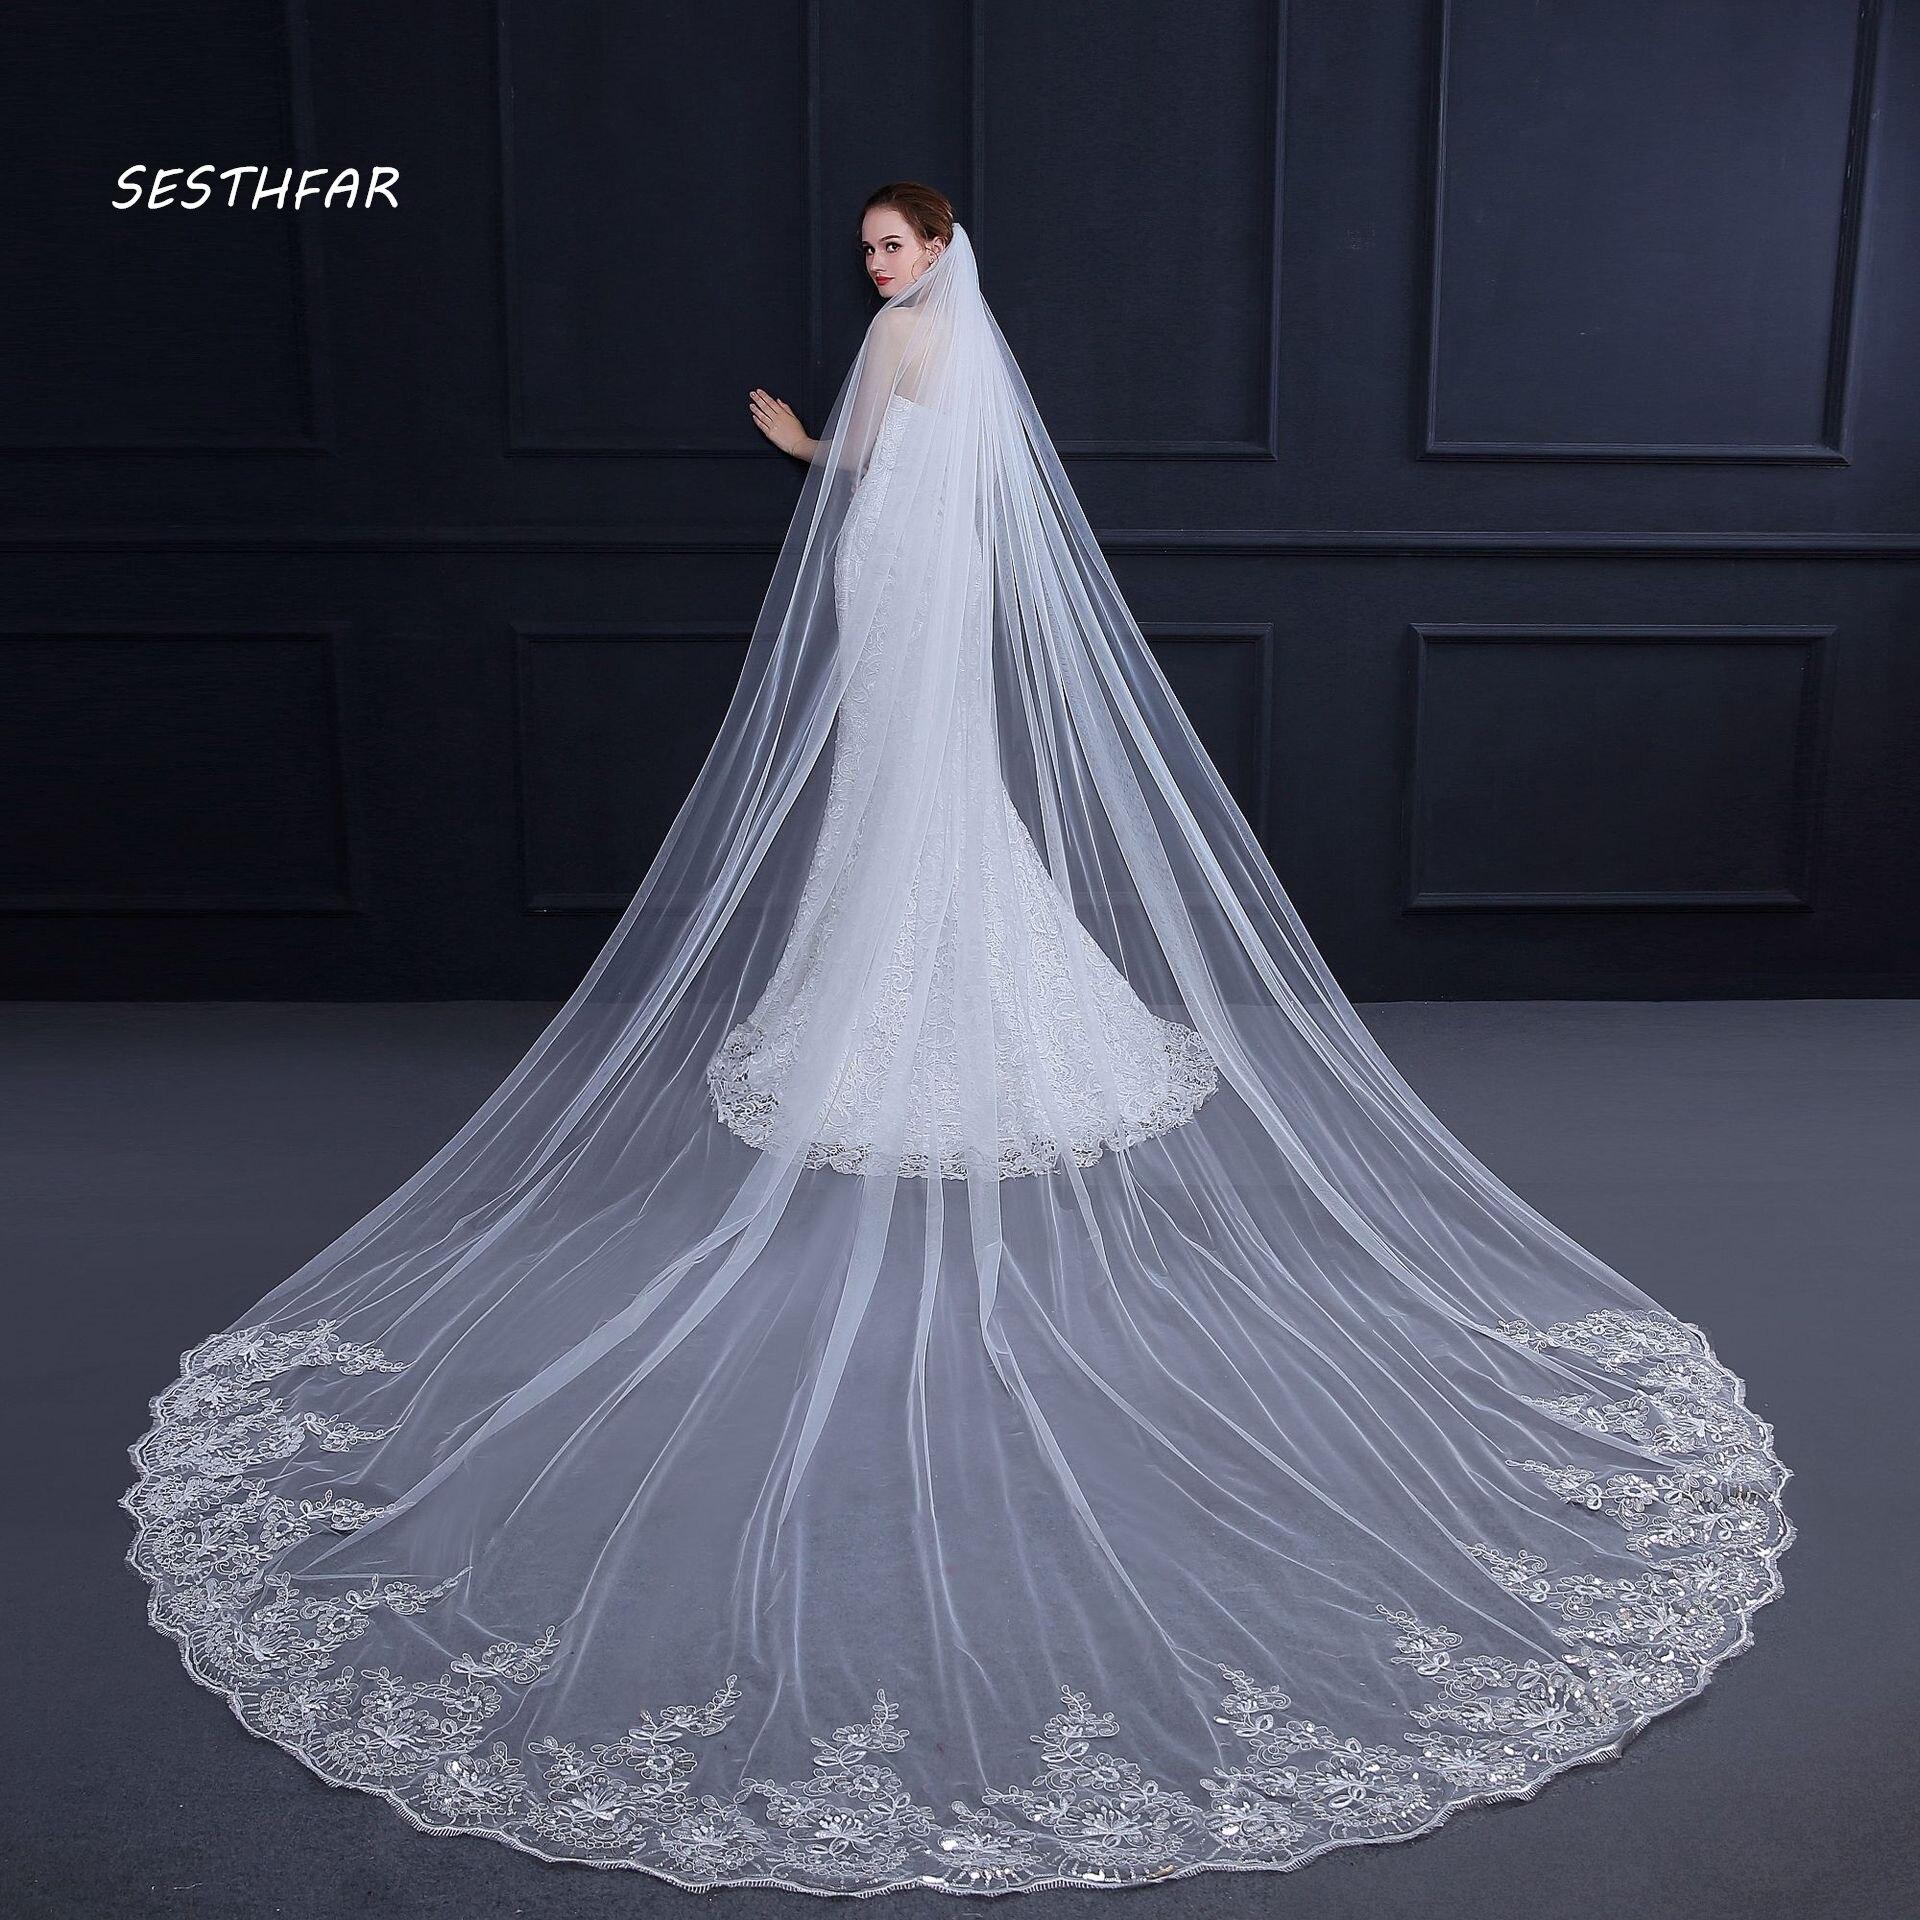 4m Long Sequins Cathedral Wedding Veil Velo De Novia 1 Tier Cut-edge Bridal Veil With Comb Bridal Wedding Accessories